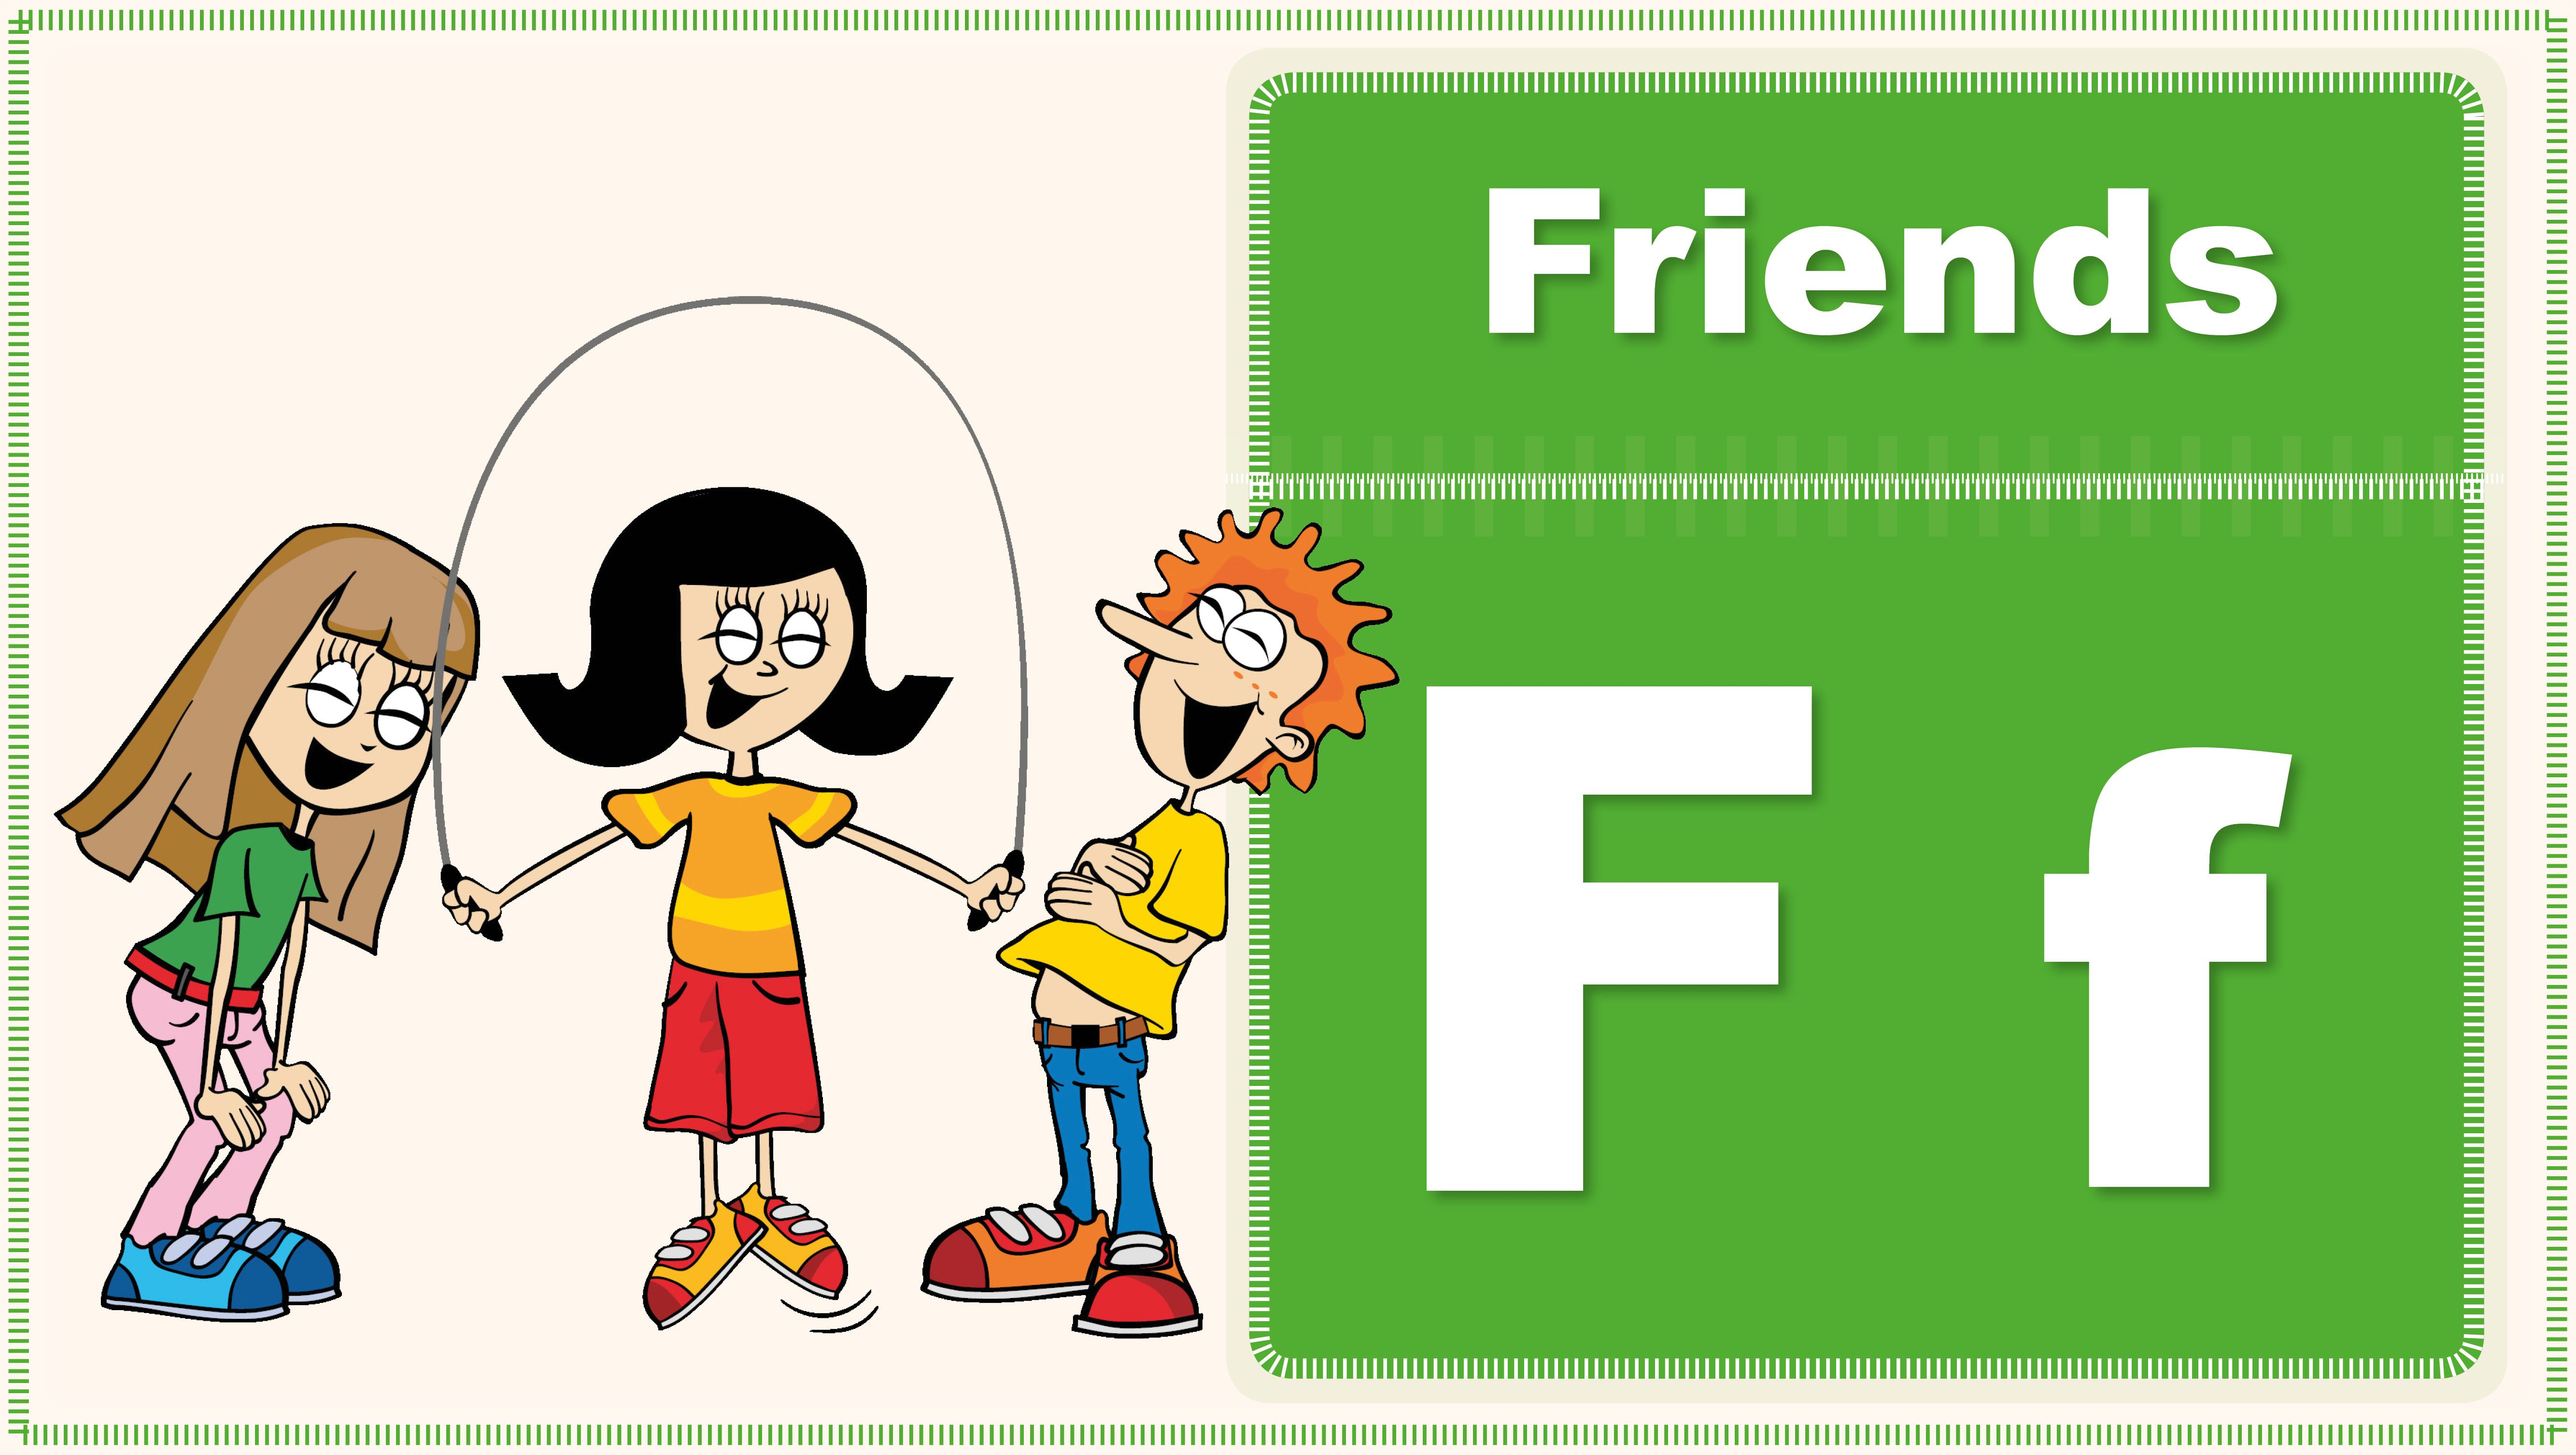 Friends Song   Letter F   Kids Songs   Little ABC   Songs for Kids ...